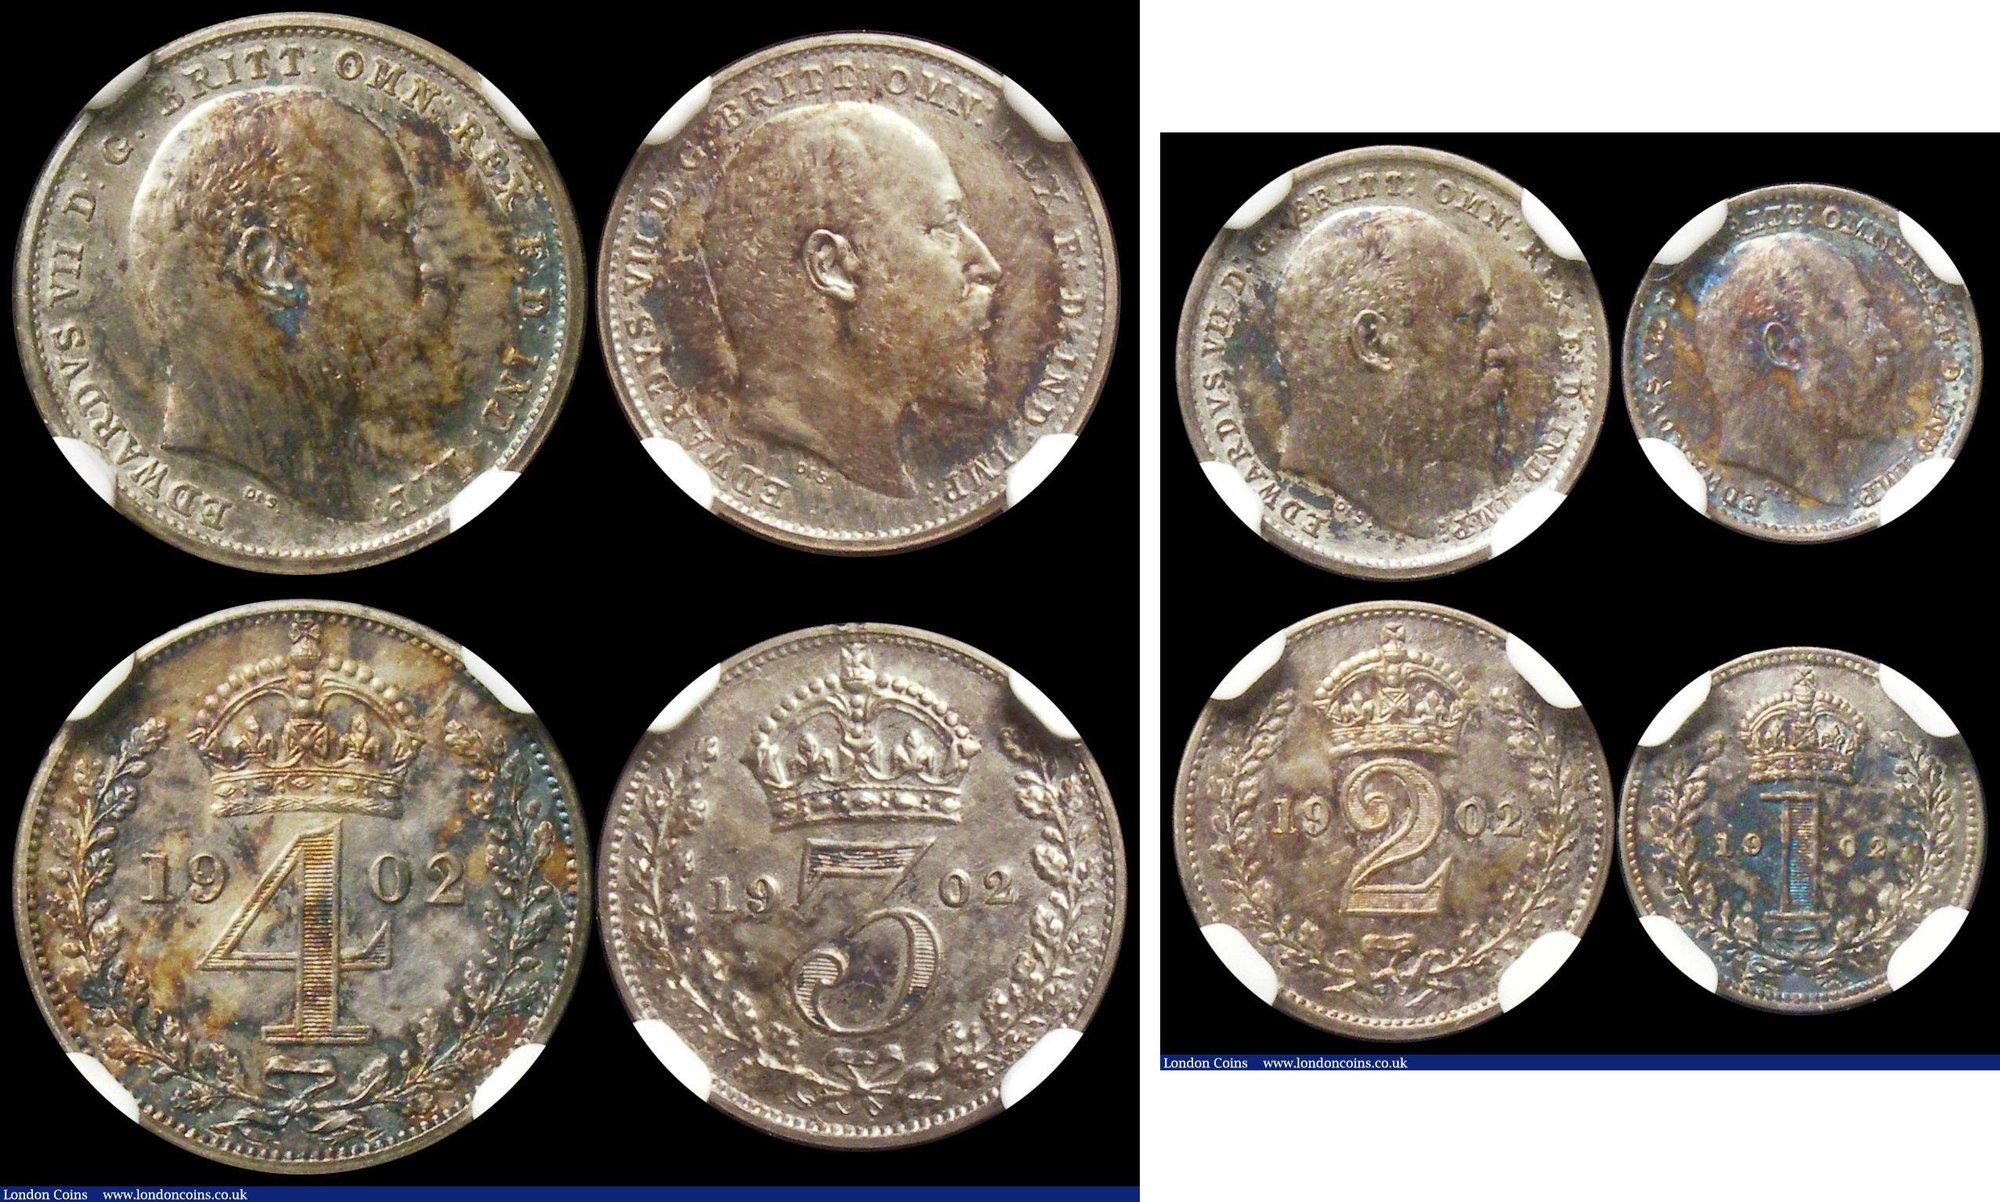 Germany Coins with Swastika #211 2 pfennig Set of 2 Reichsmark 1